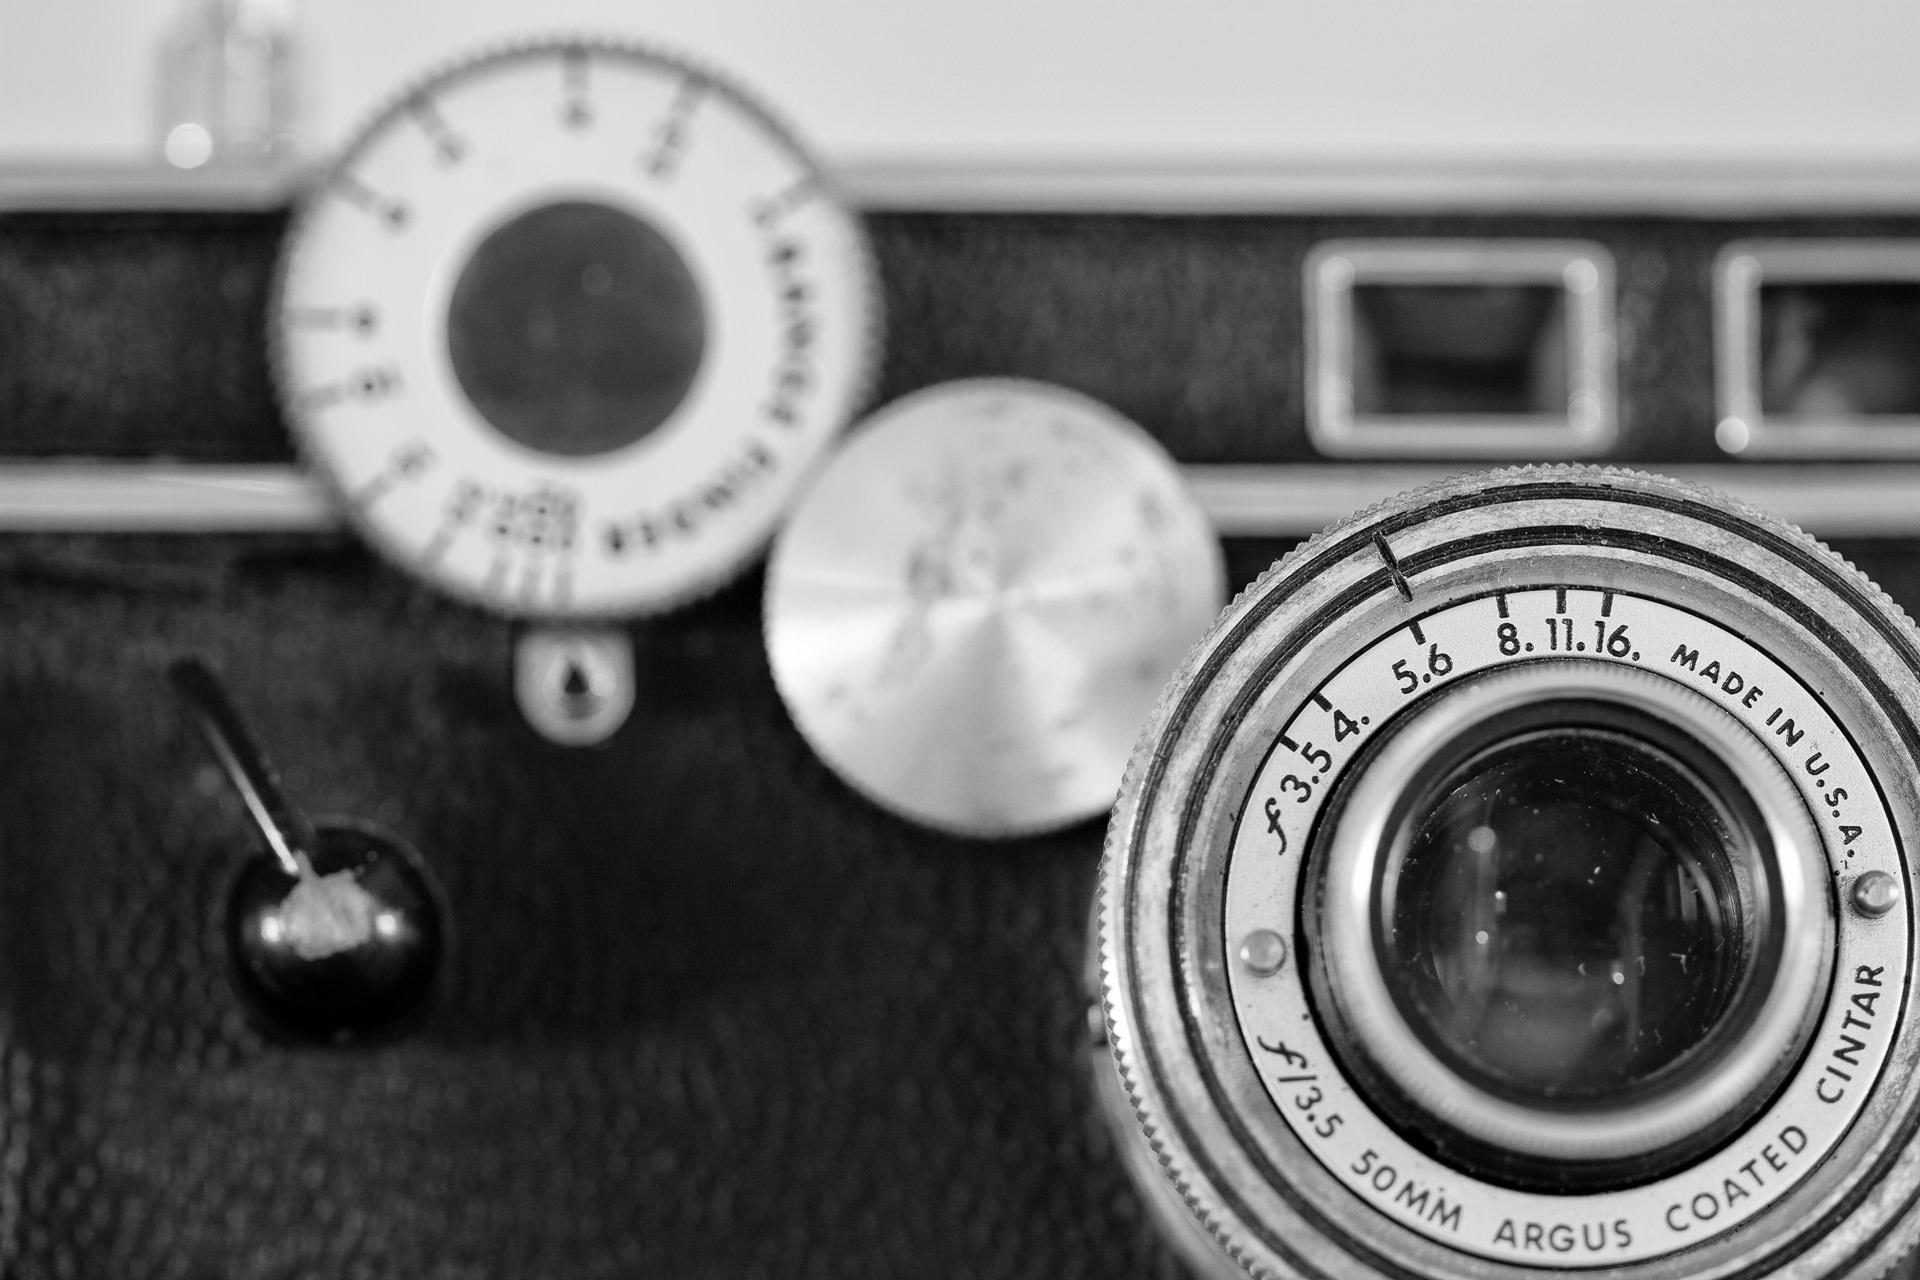 Vintage Argus Rangefinder Camera, aka | on 3 Ways a Photography Coach Cane Make You a Better Photographer